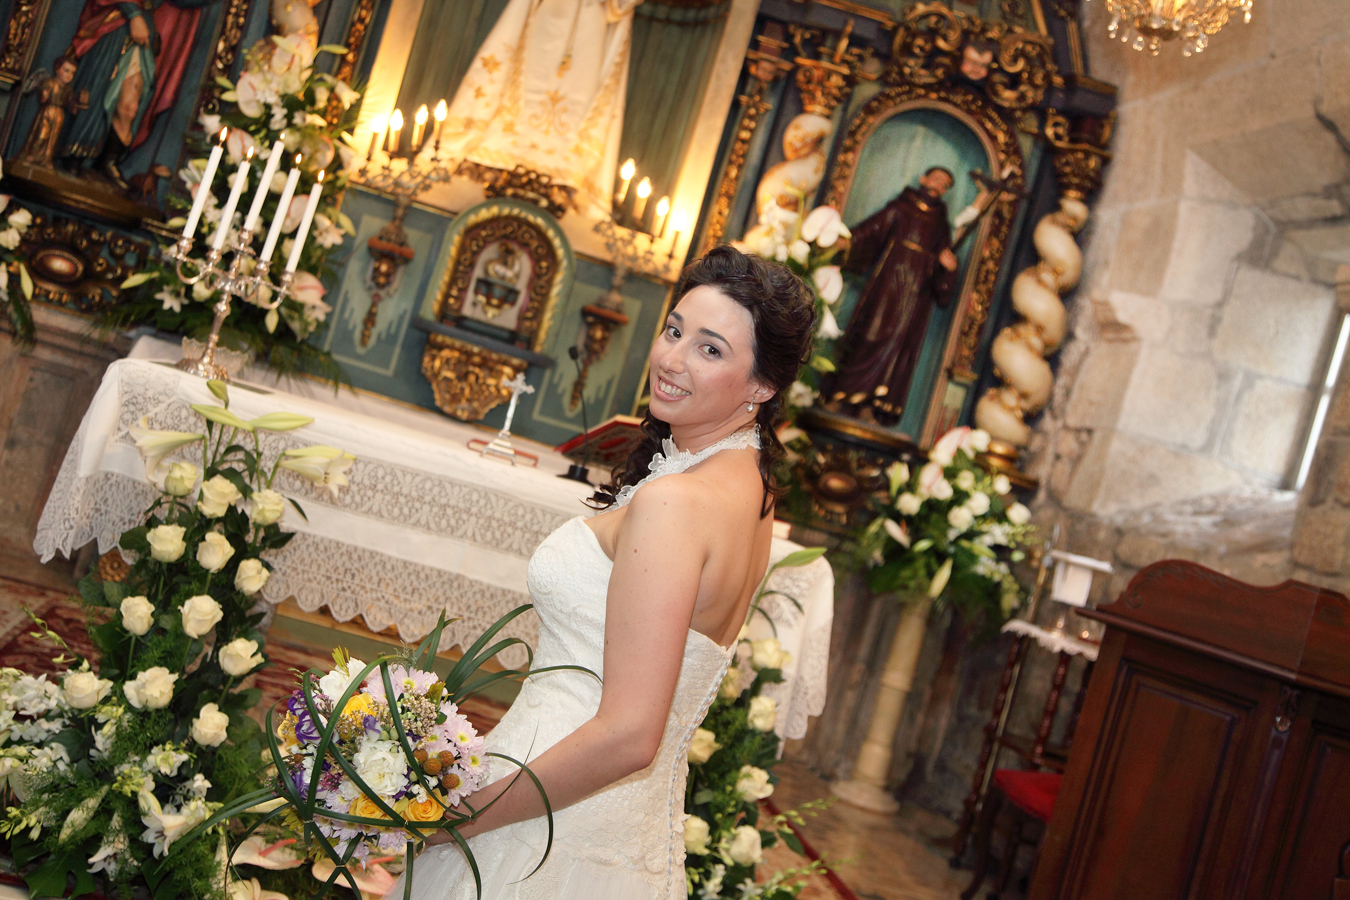 boda-pobra-caramiñal-post-boda-playa5boda-pobra-caramiñal-post-boda-playa5